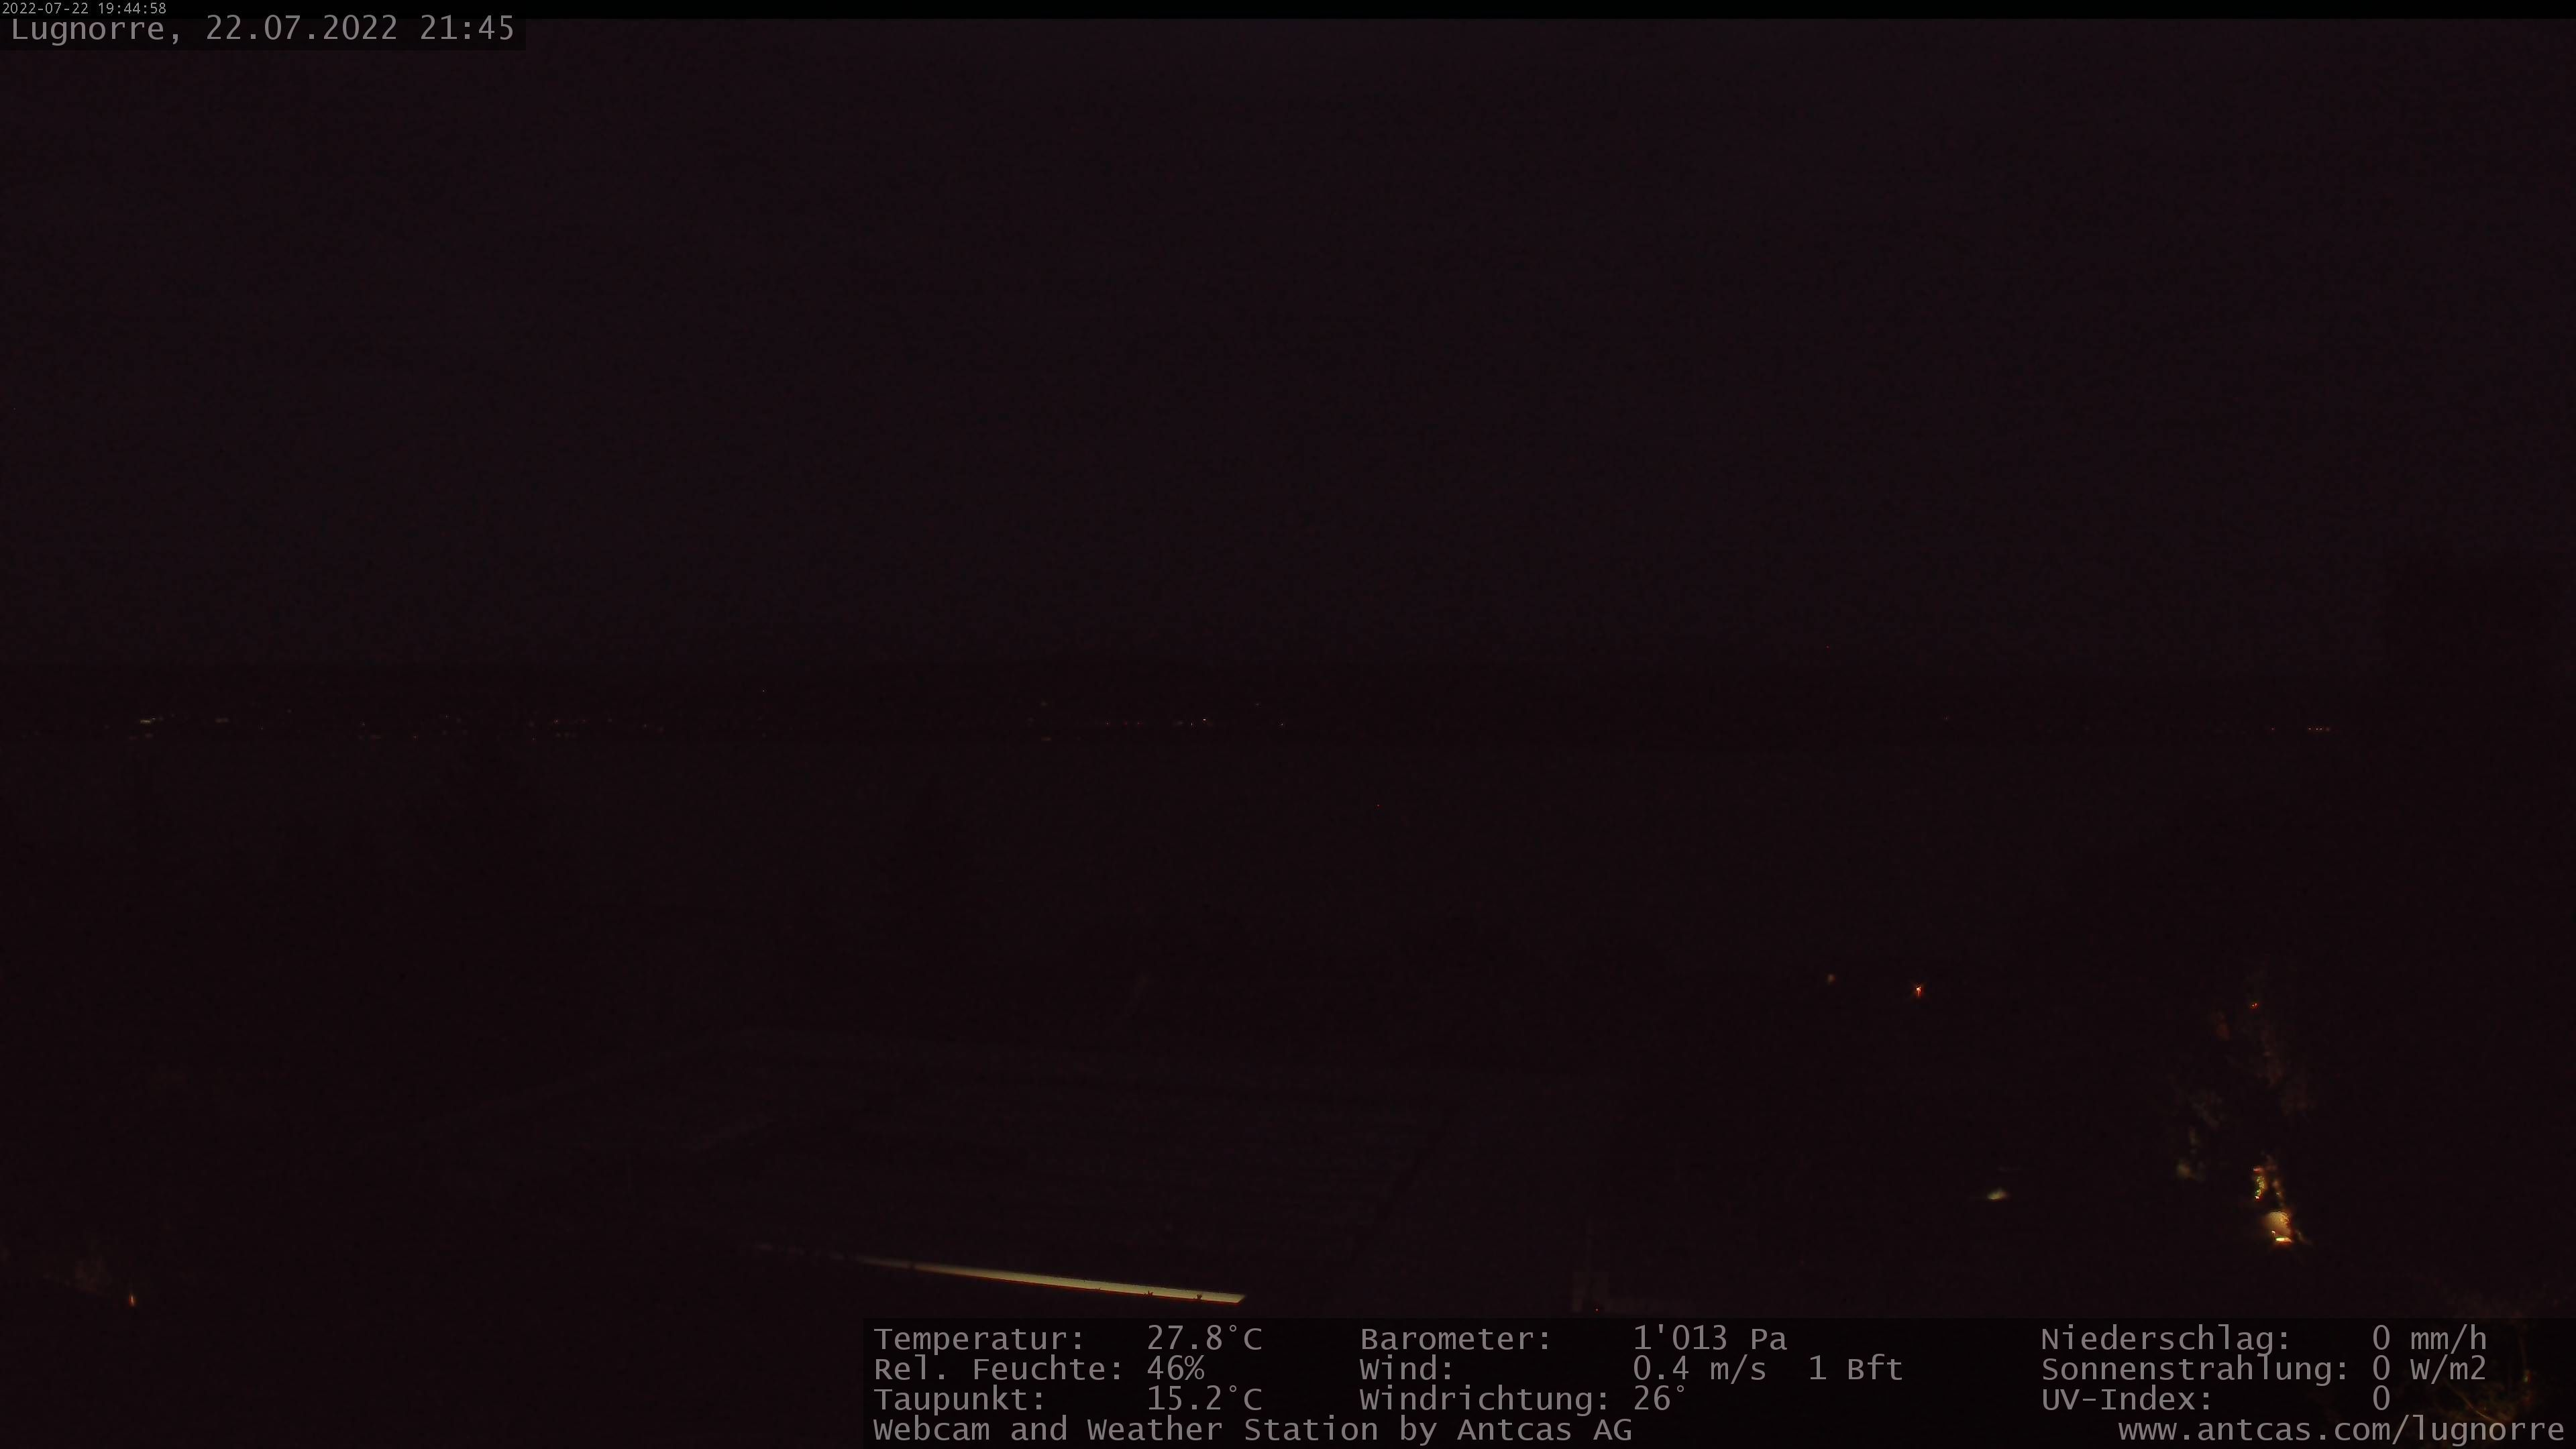 Lugnorre › Süd: Lake Murten